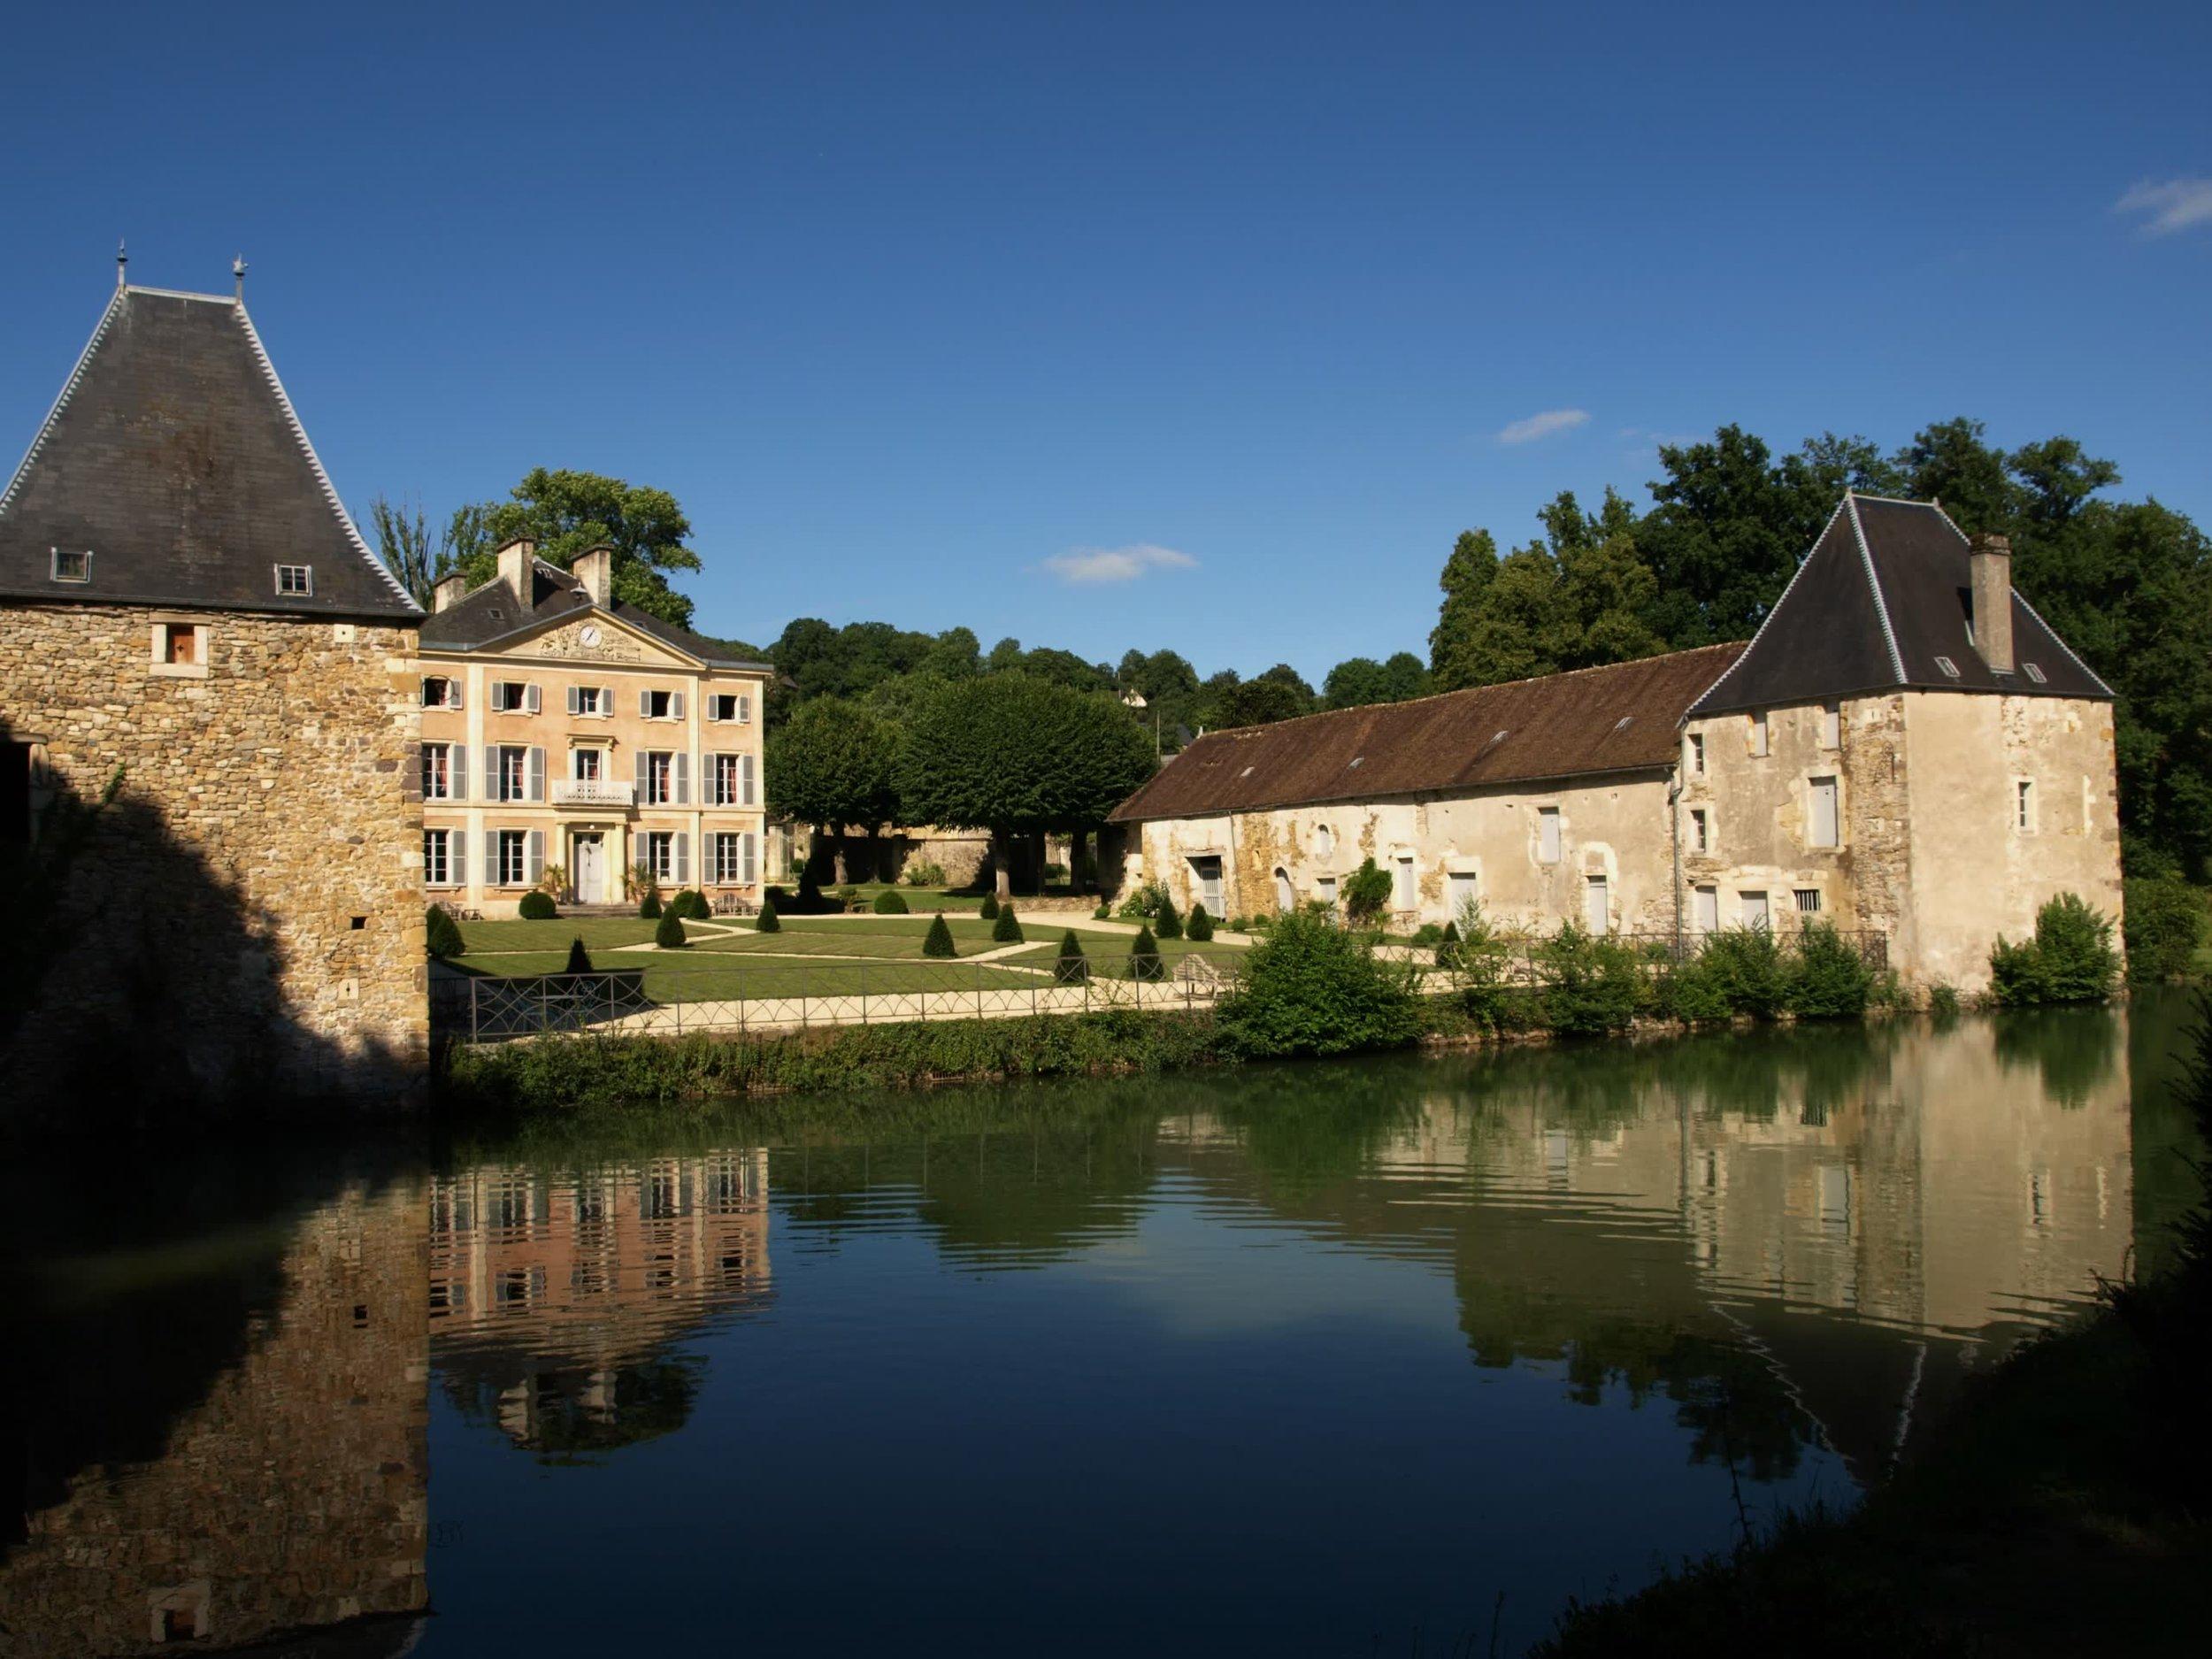 Chateau de la Pommeraye - charming boutique hotel chateau b&b spa normandy calvados 2(2).jpg